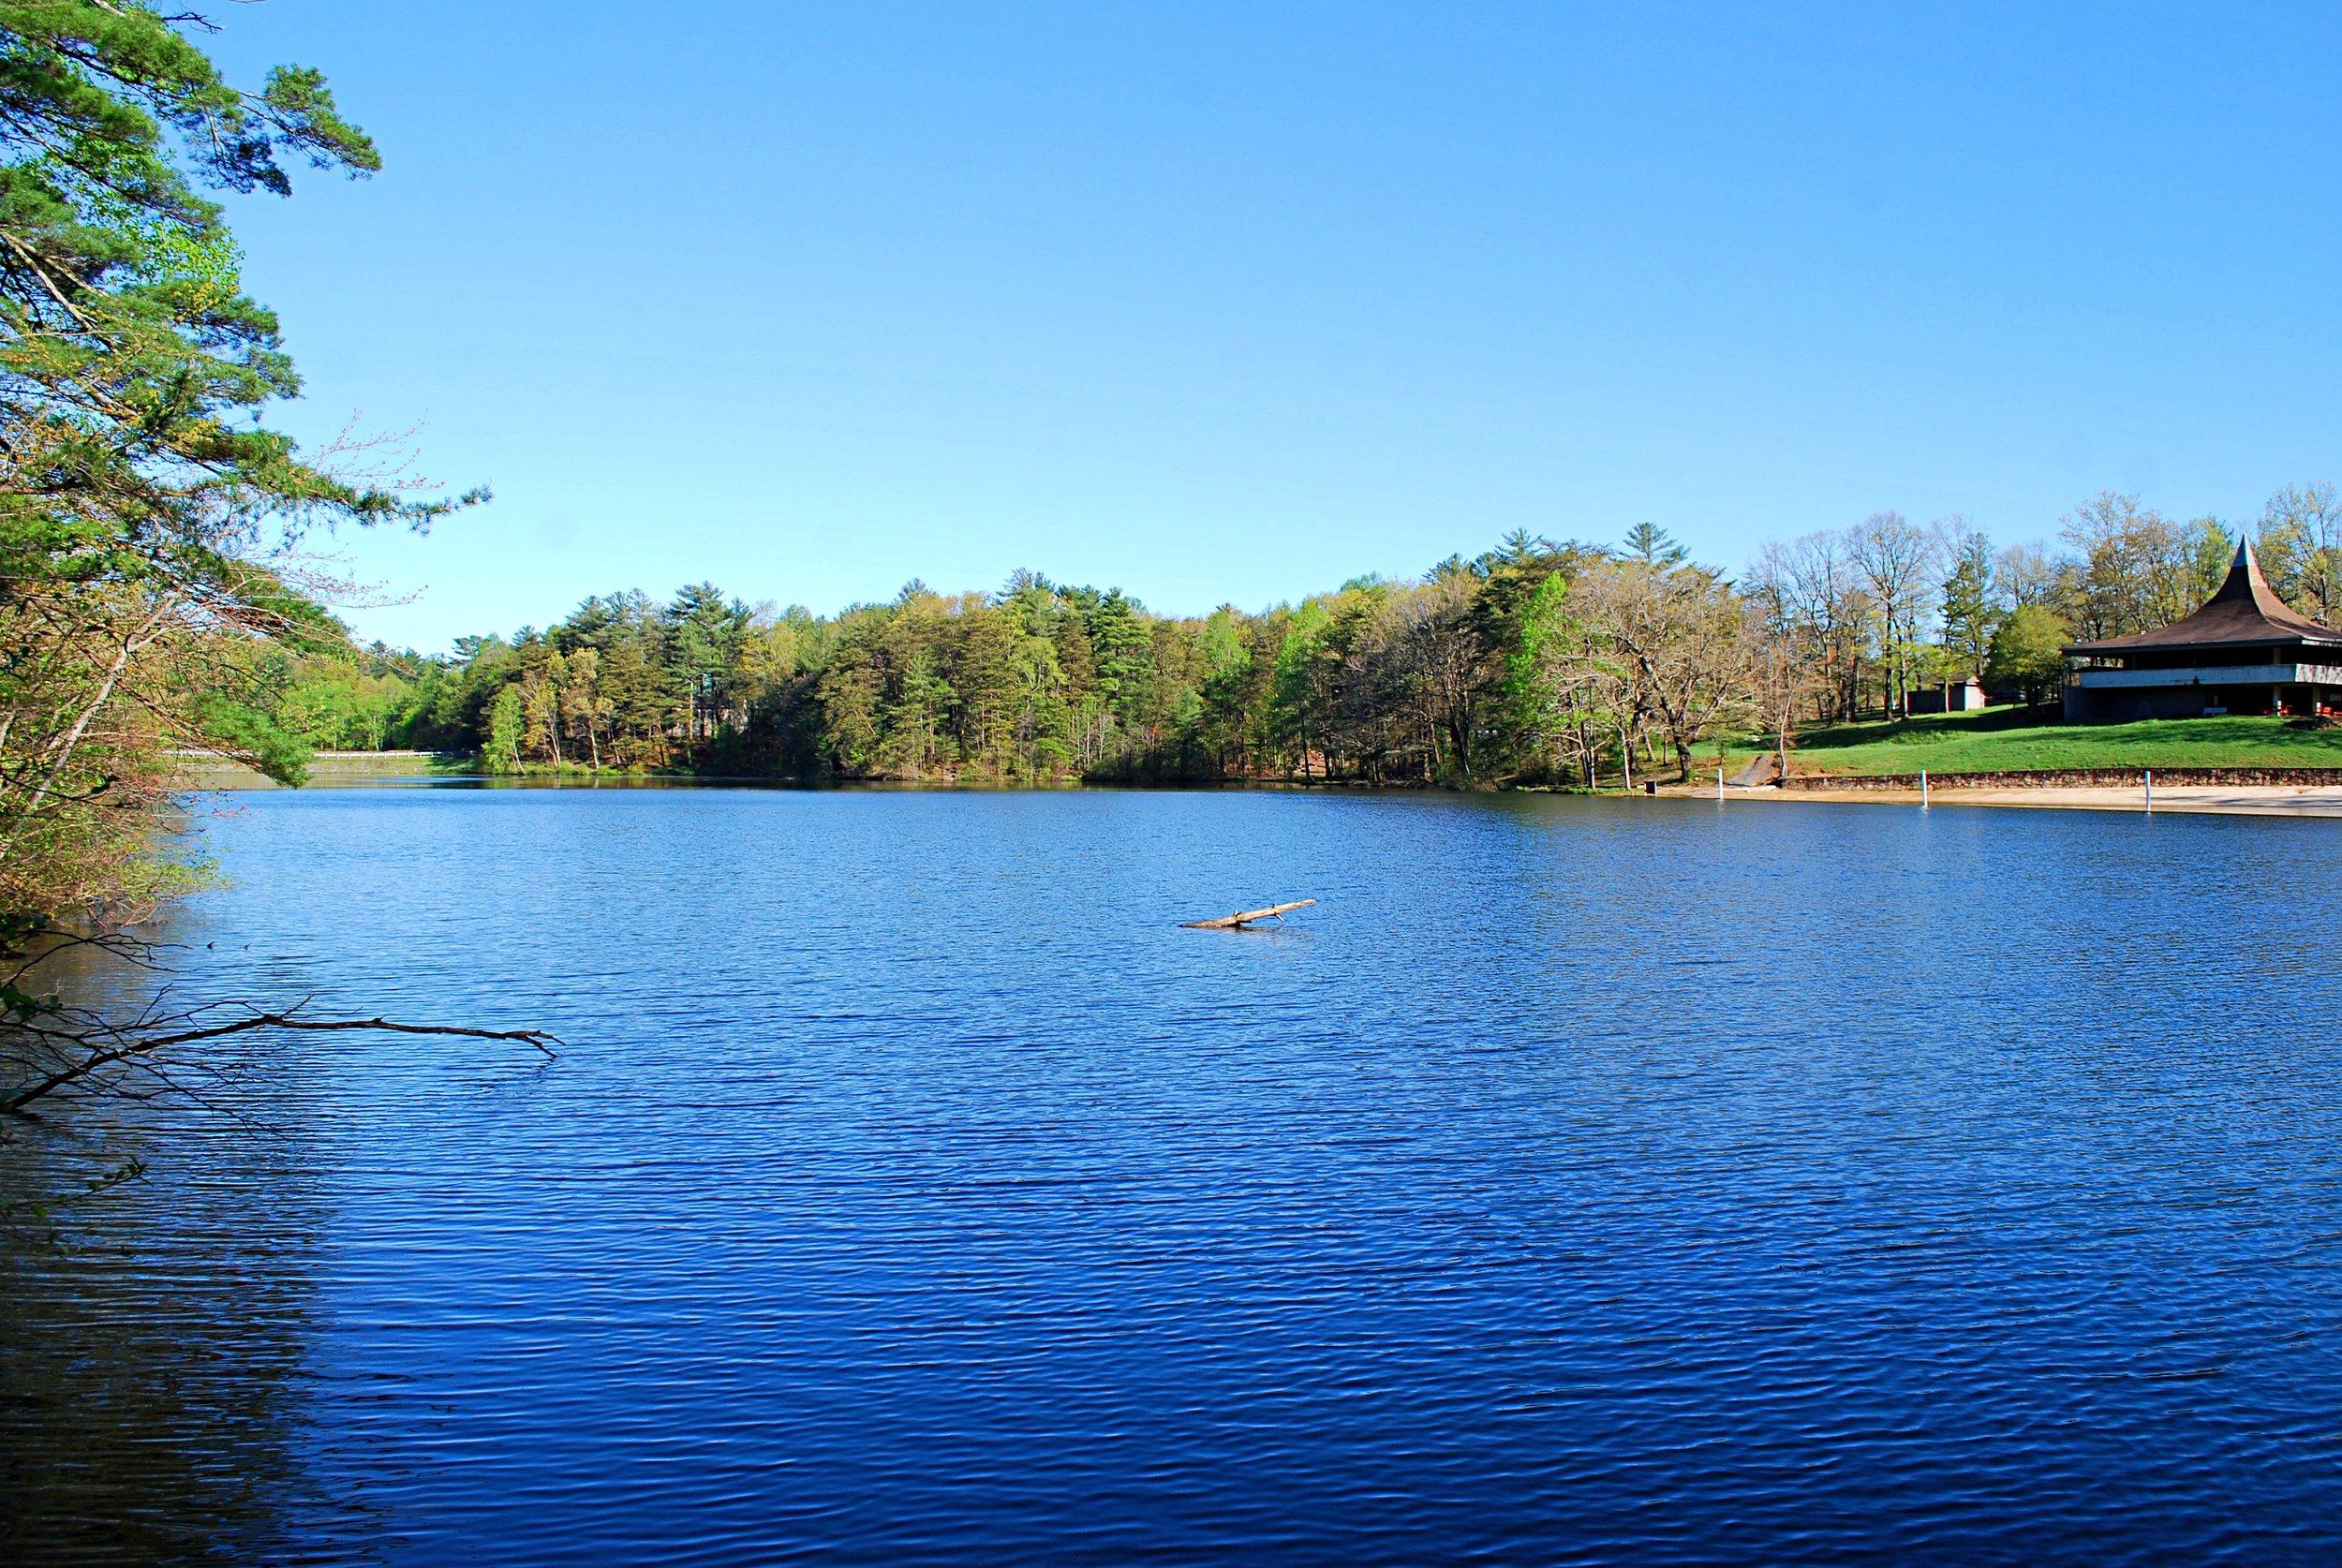 The park's 17 acre lake. Photo: Bob Butters